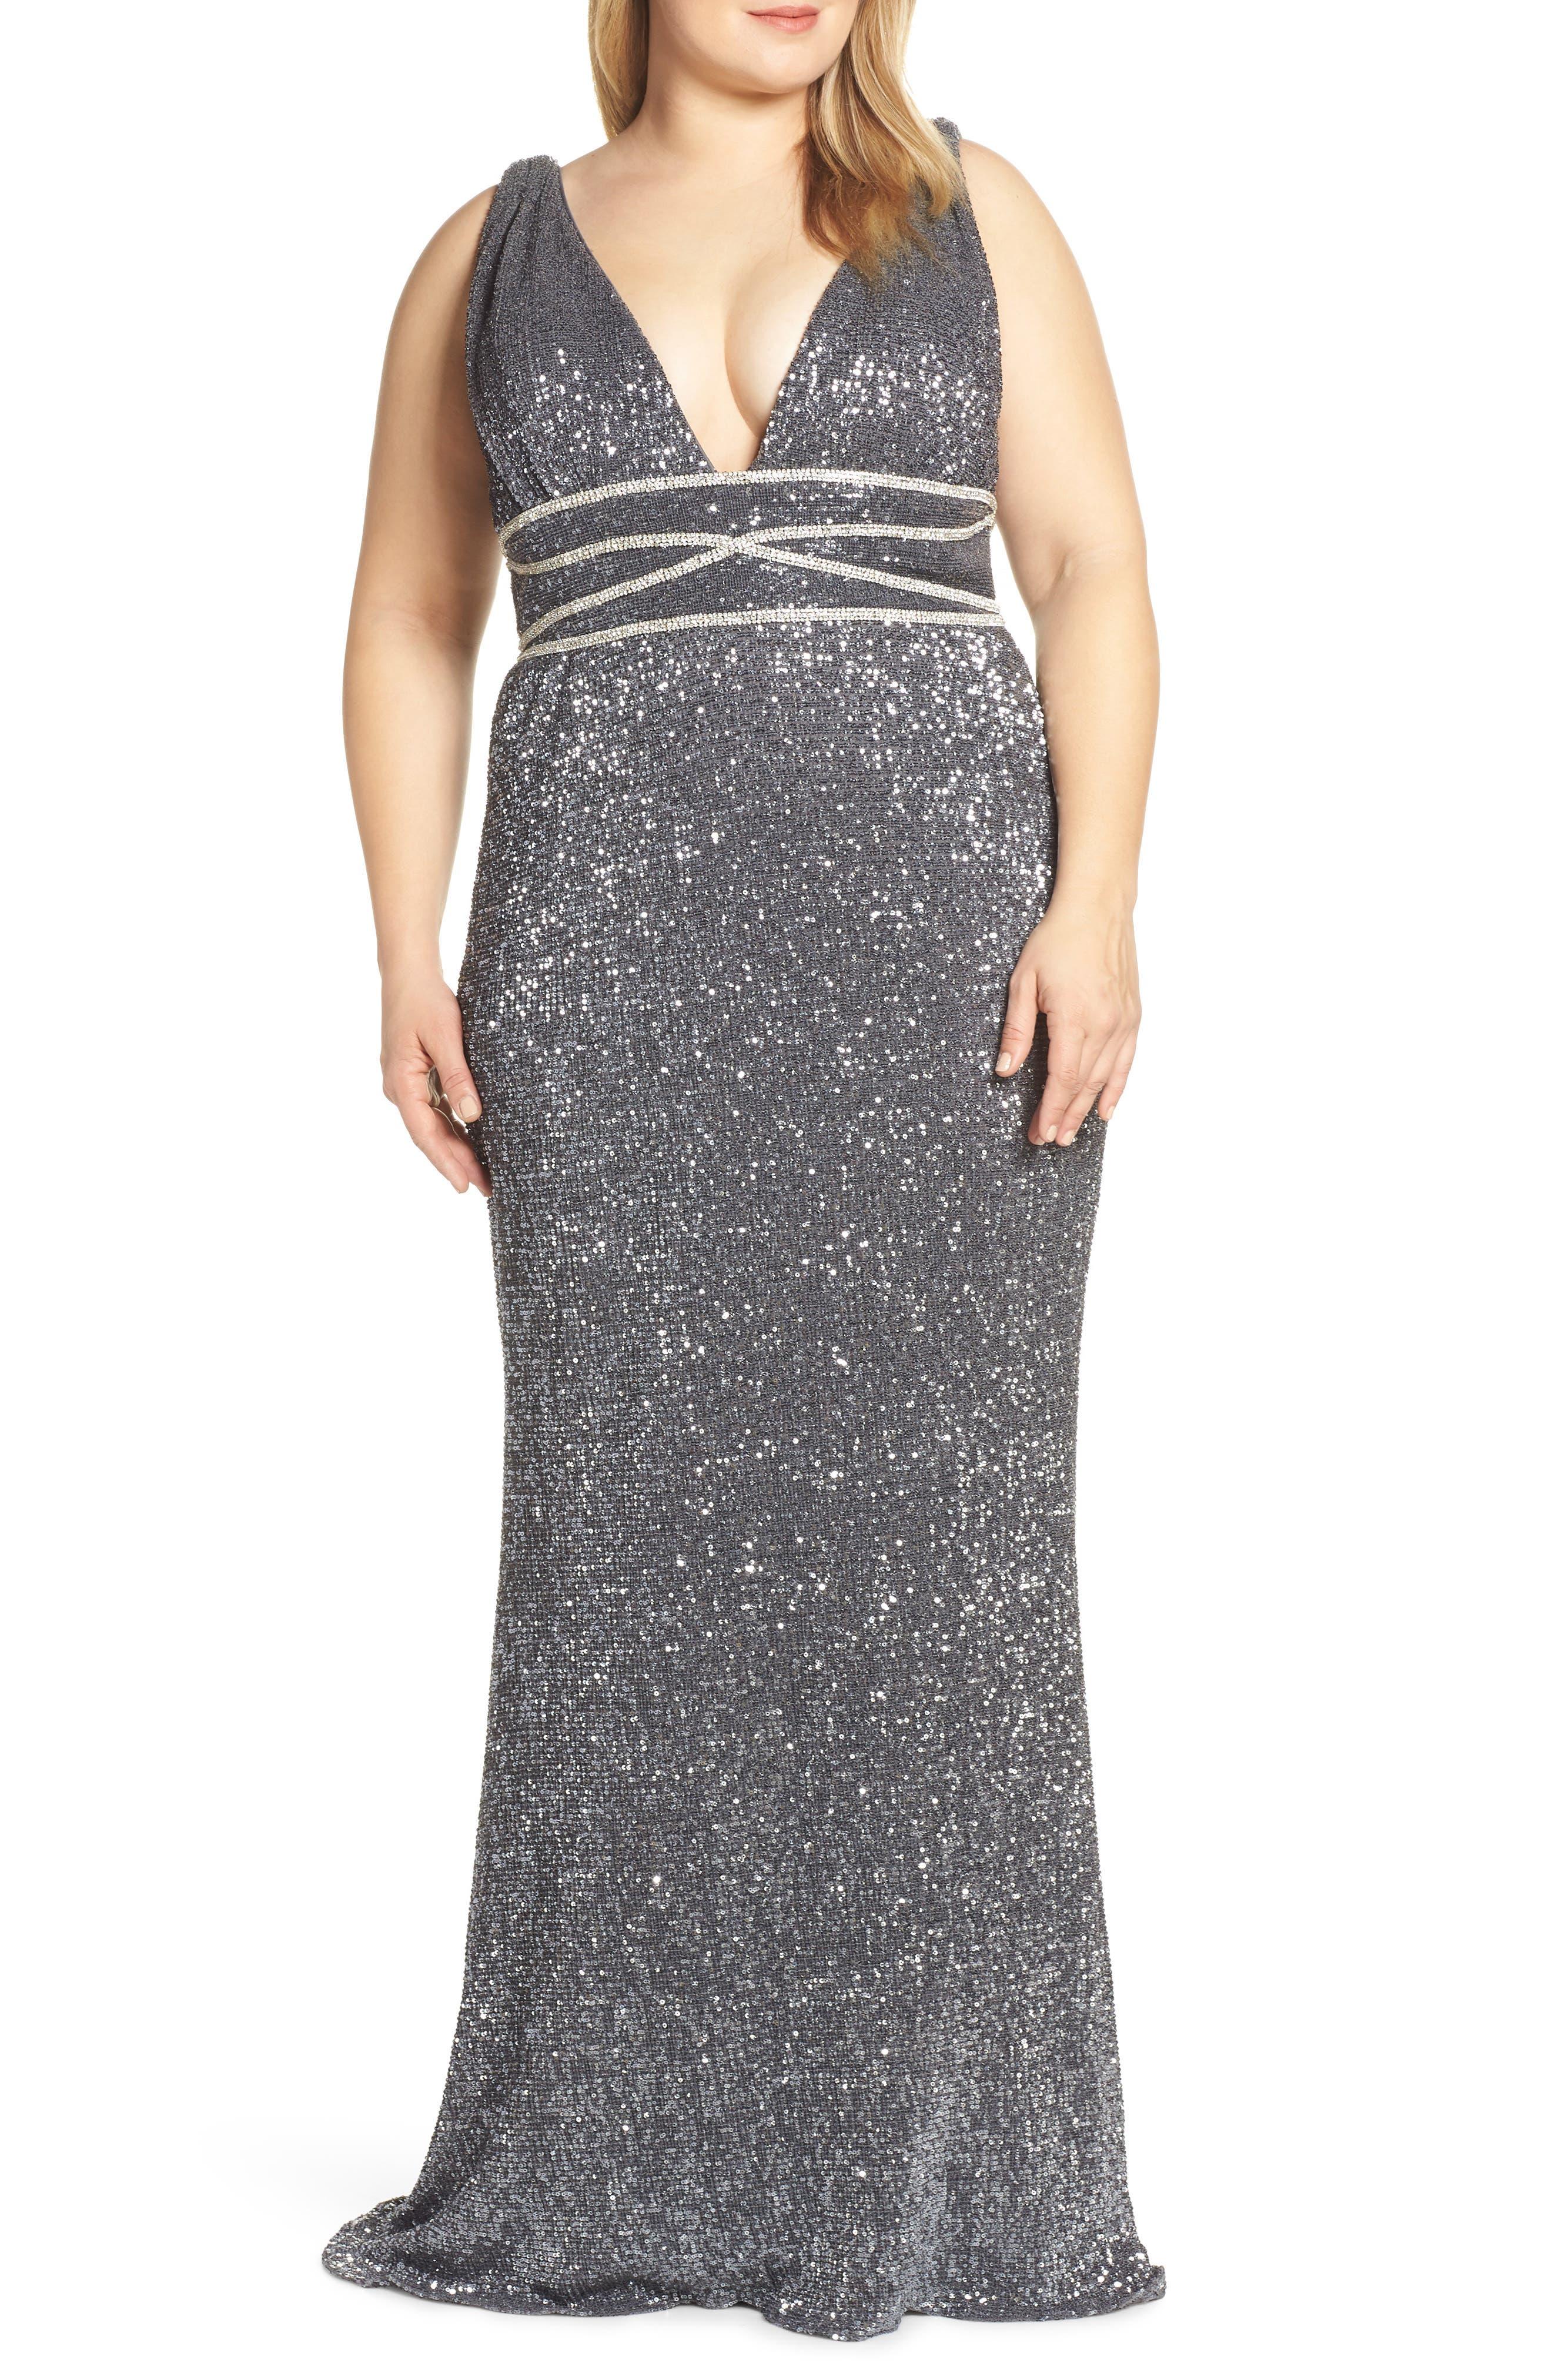 MAC DUGGAL Beaded Waist Sequin Evening Dress, Main, color, CHARCOAL